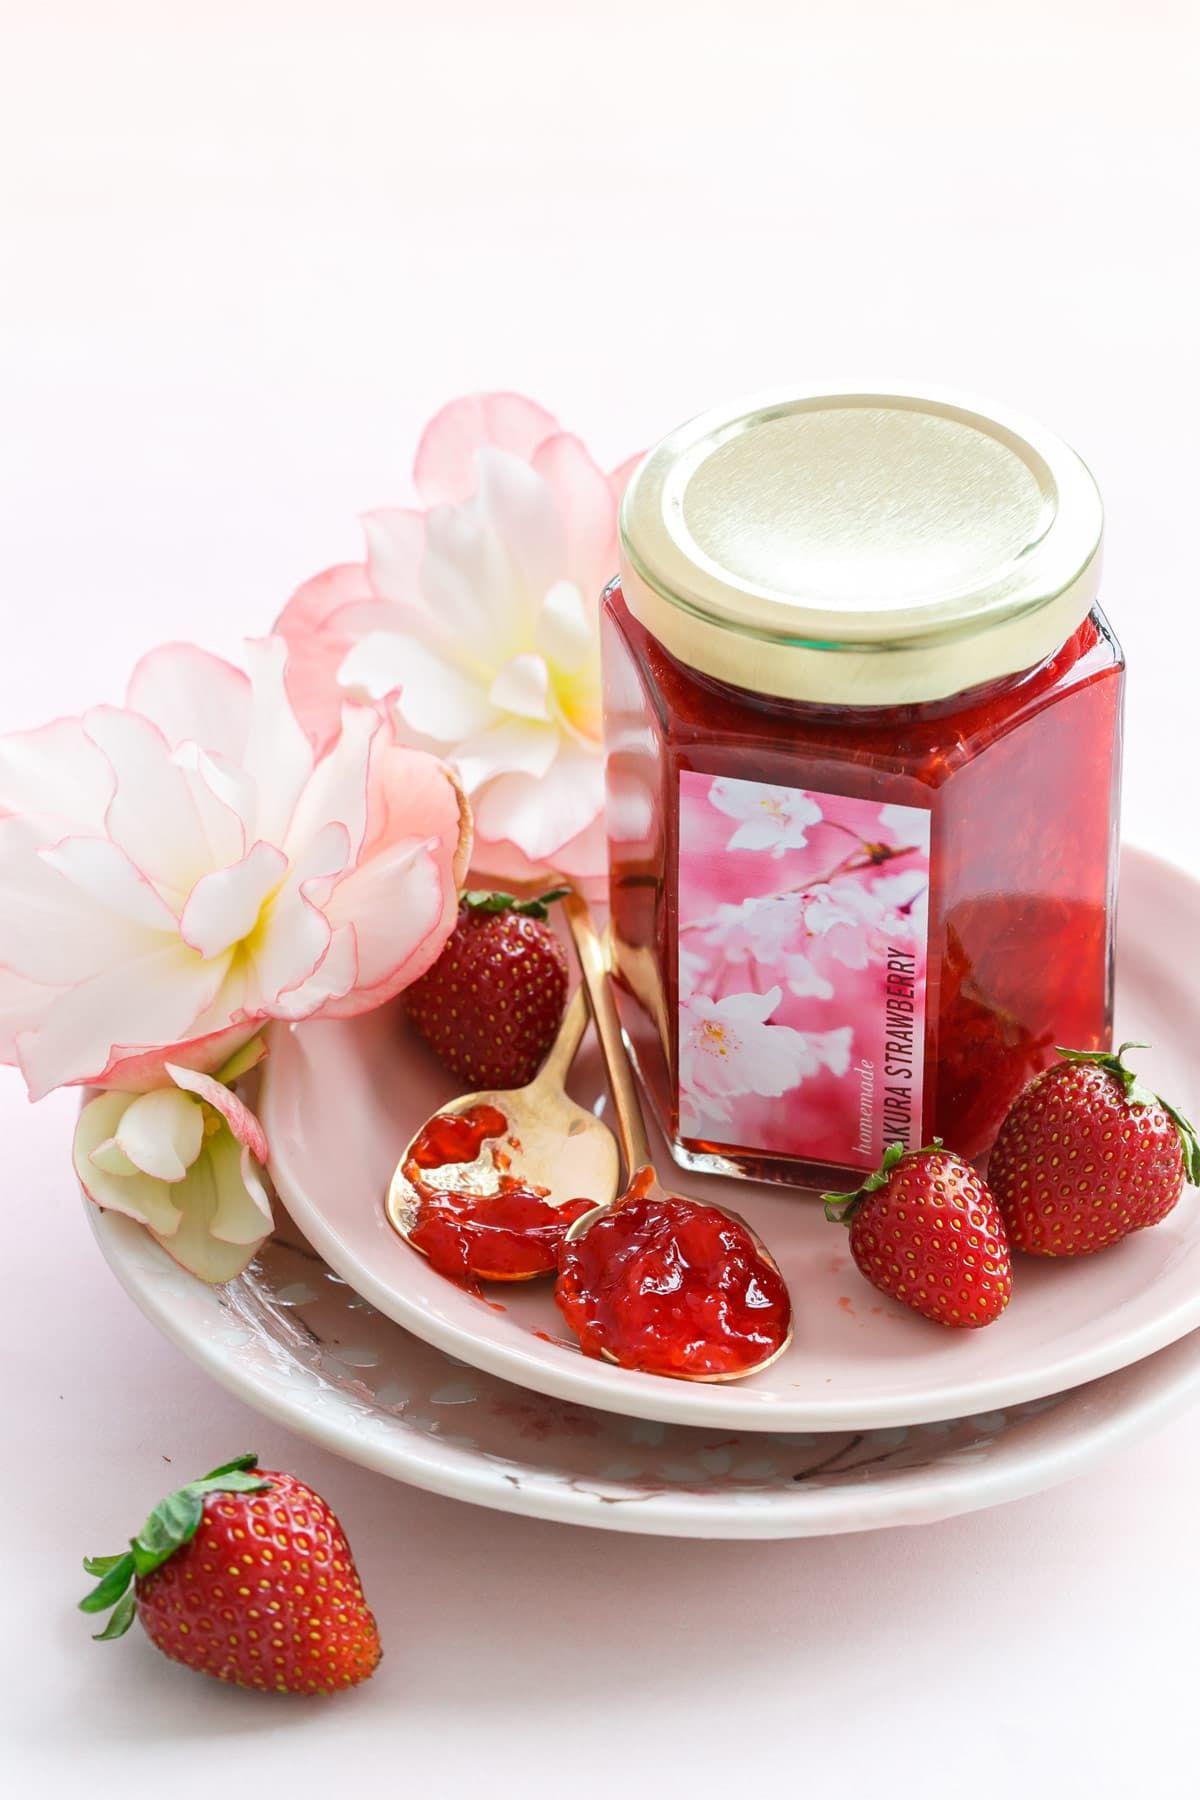 Sakura Strawberry Jam Recipe With Images Strawberry Jam Jam